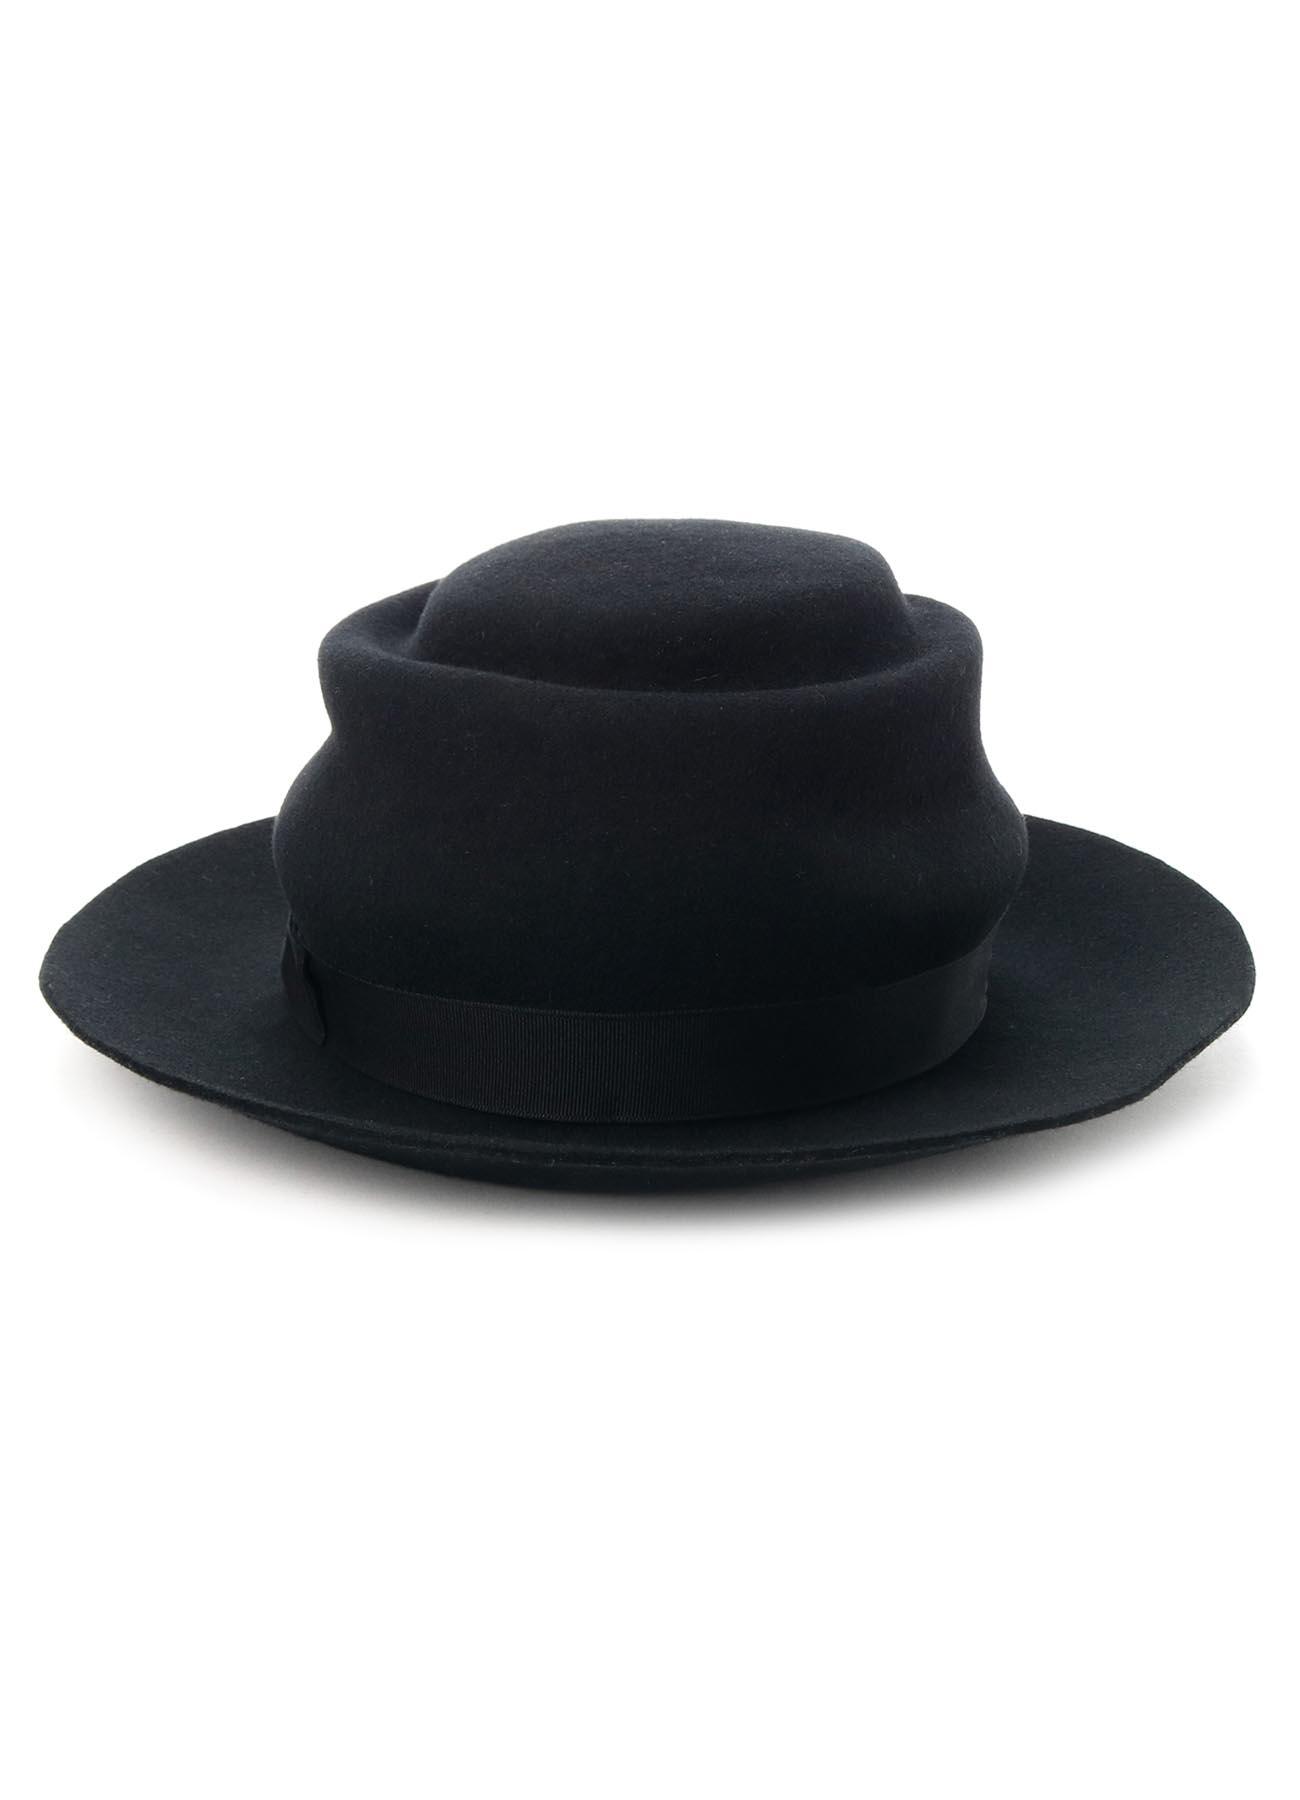 WOOL HAT BODY CRUMPLED WOOL HAT